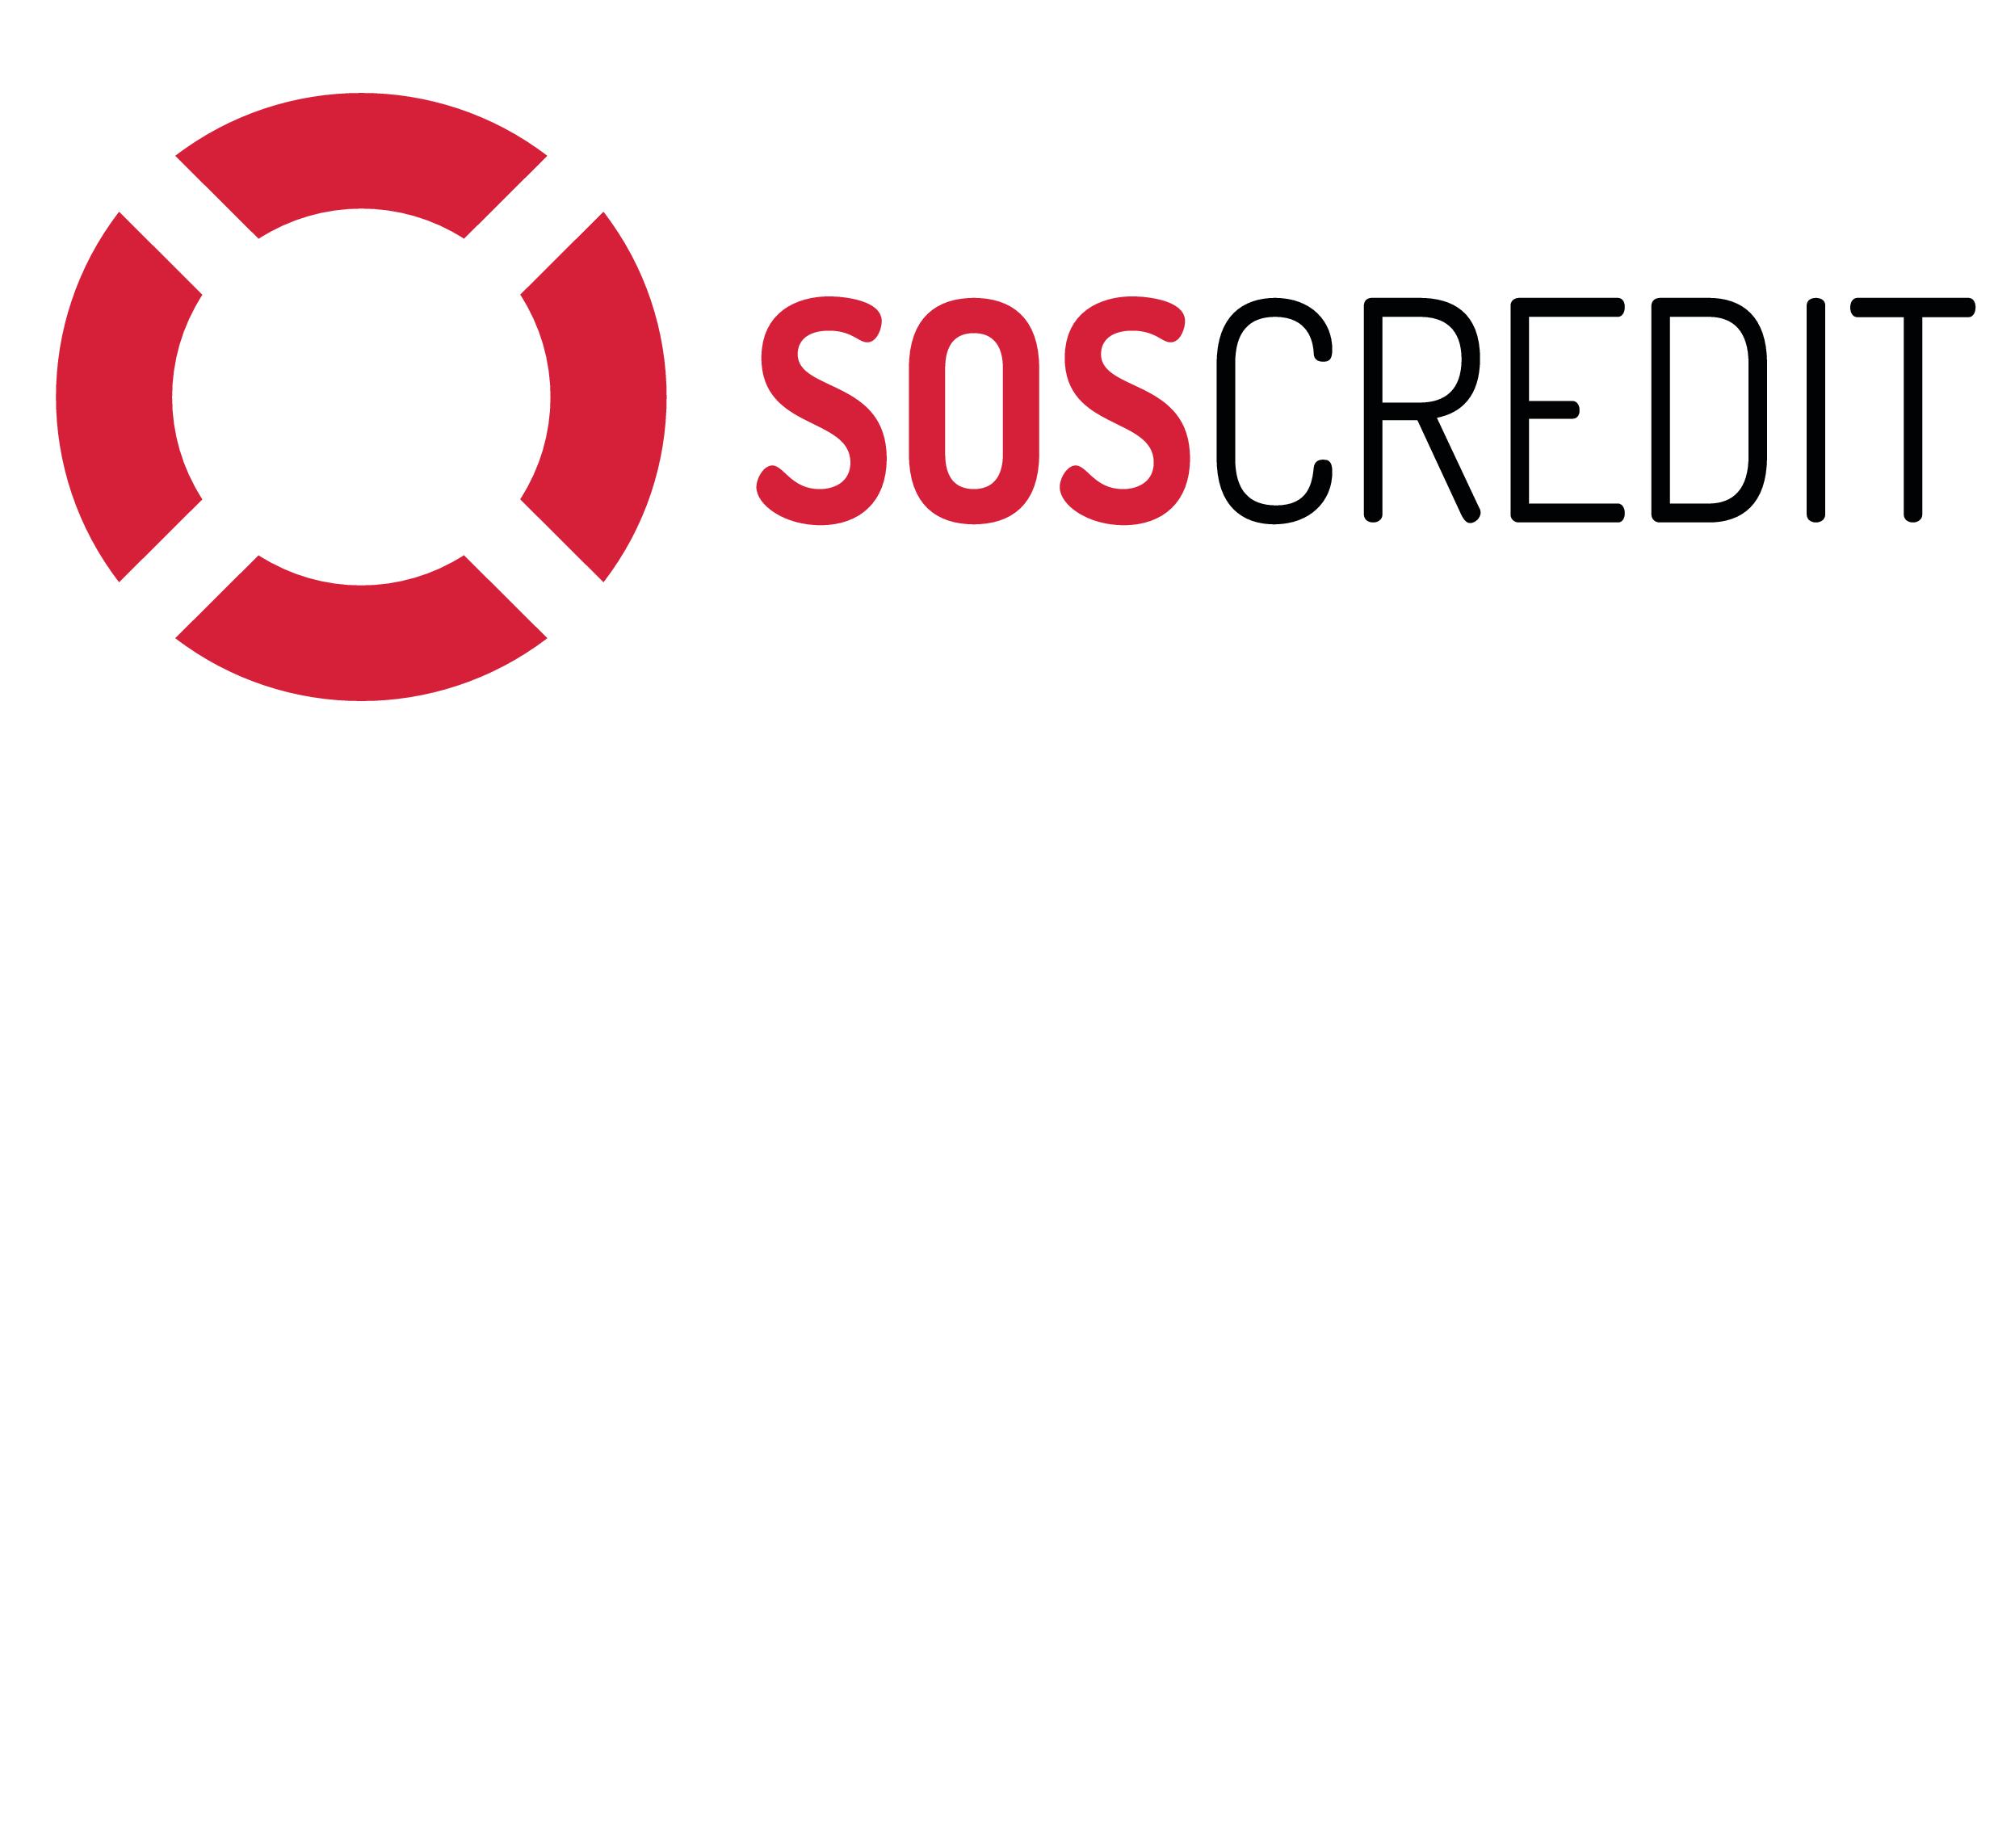 soscredit.ua logo